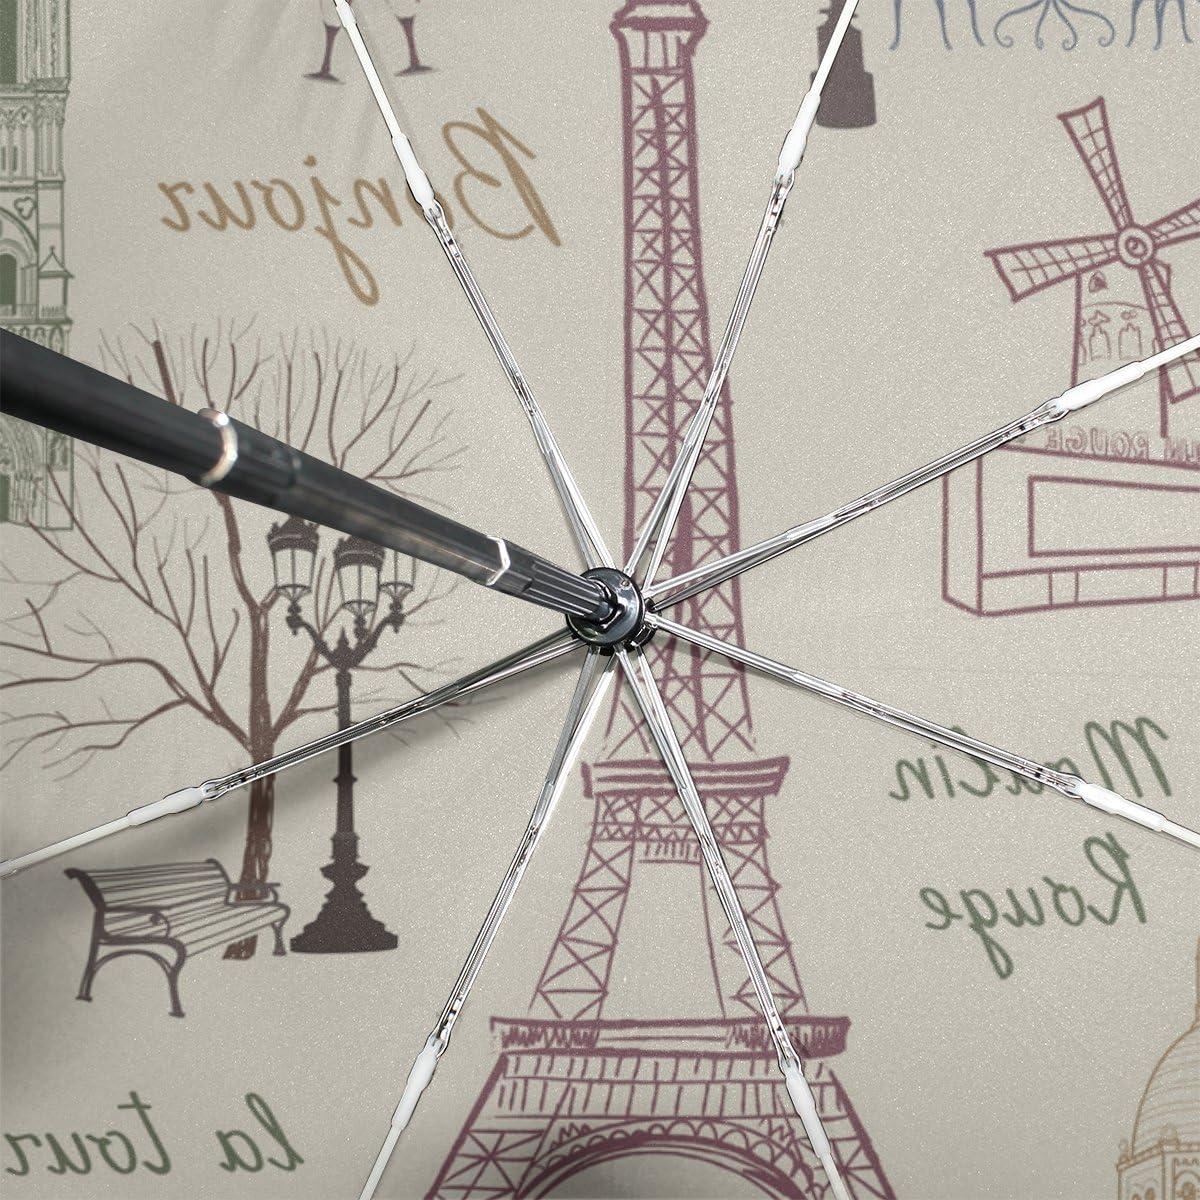 GIOVANIOR Travel Paris Eiffel Tower Landmark Umbrella Double Sided Canopy Auto Open Close Foldable Travel Rain Umbrellas